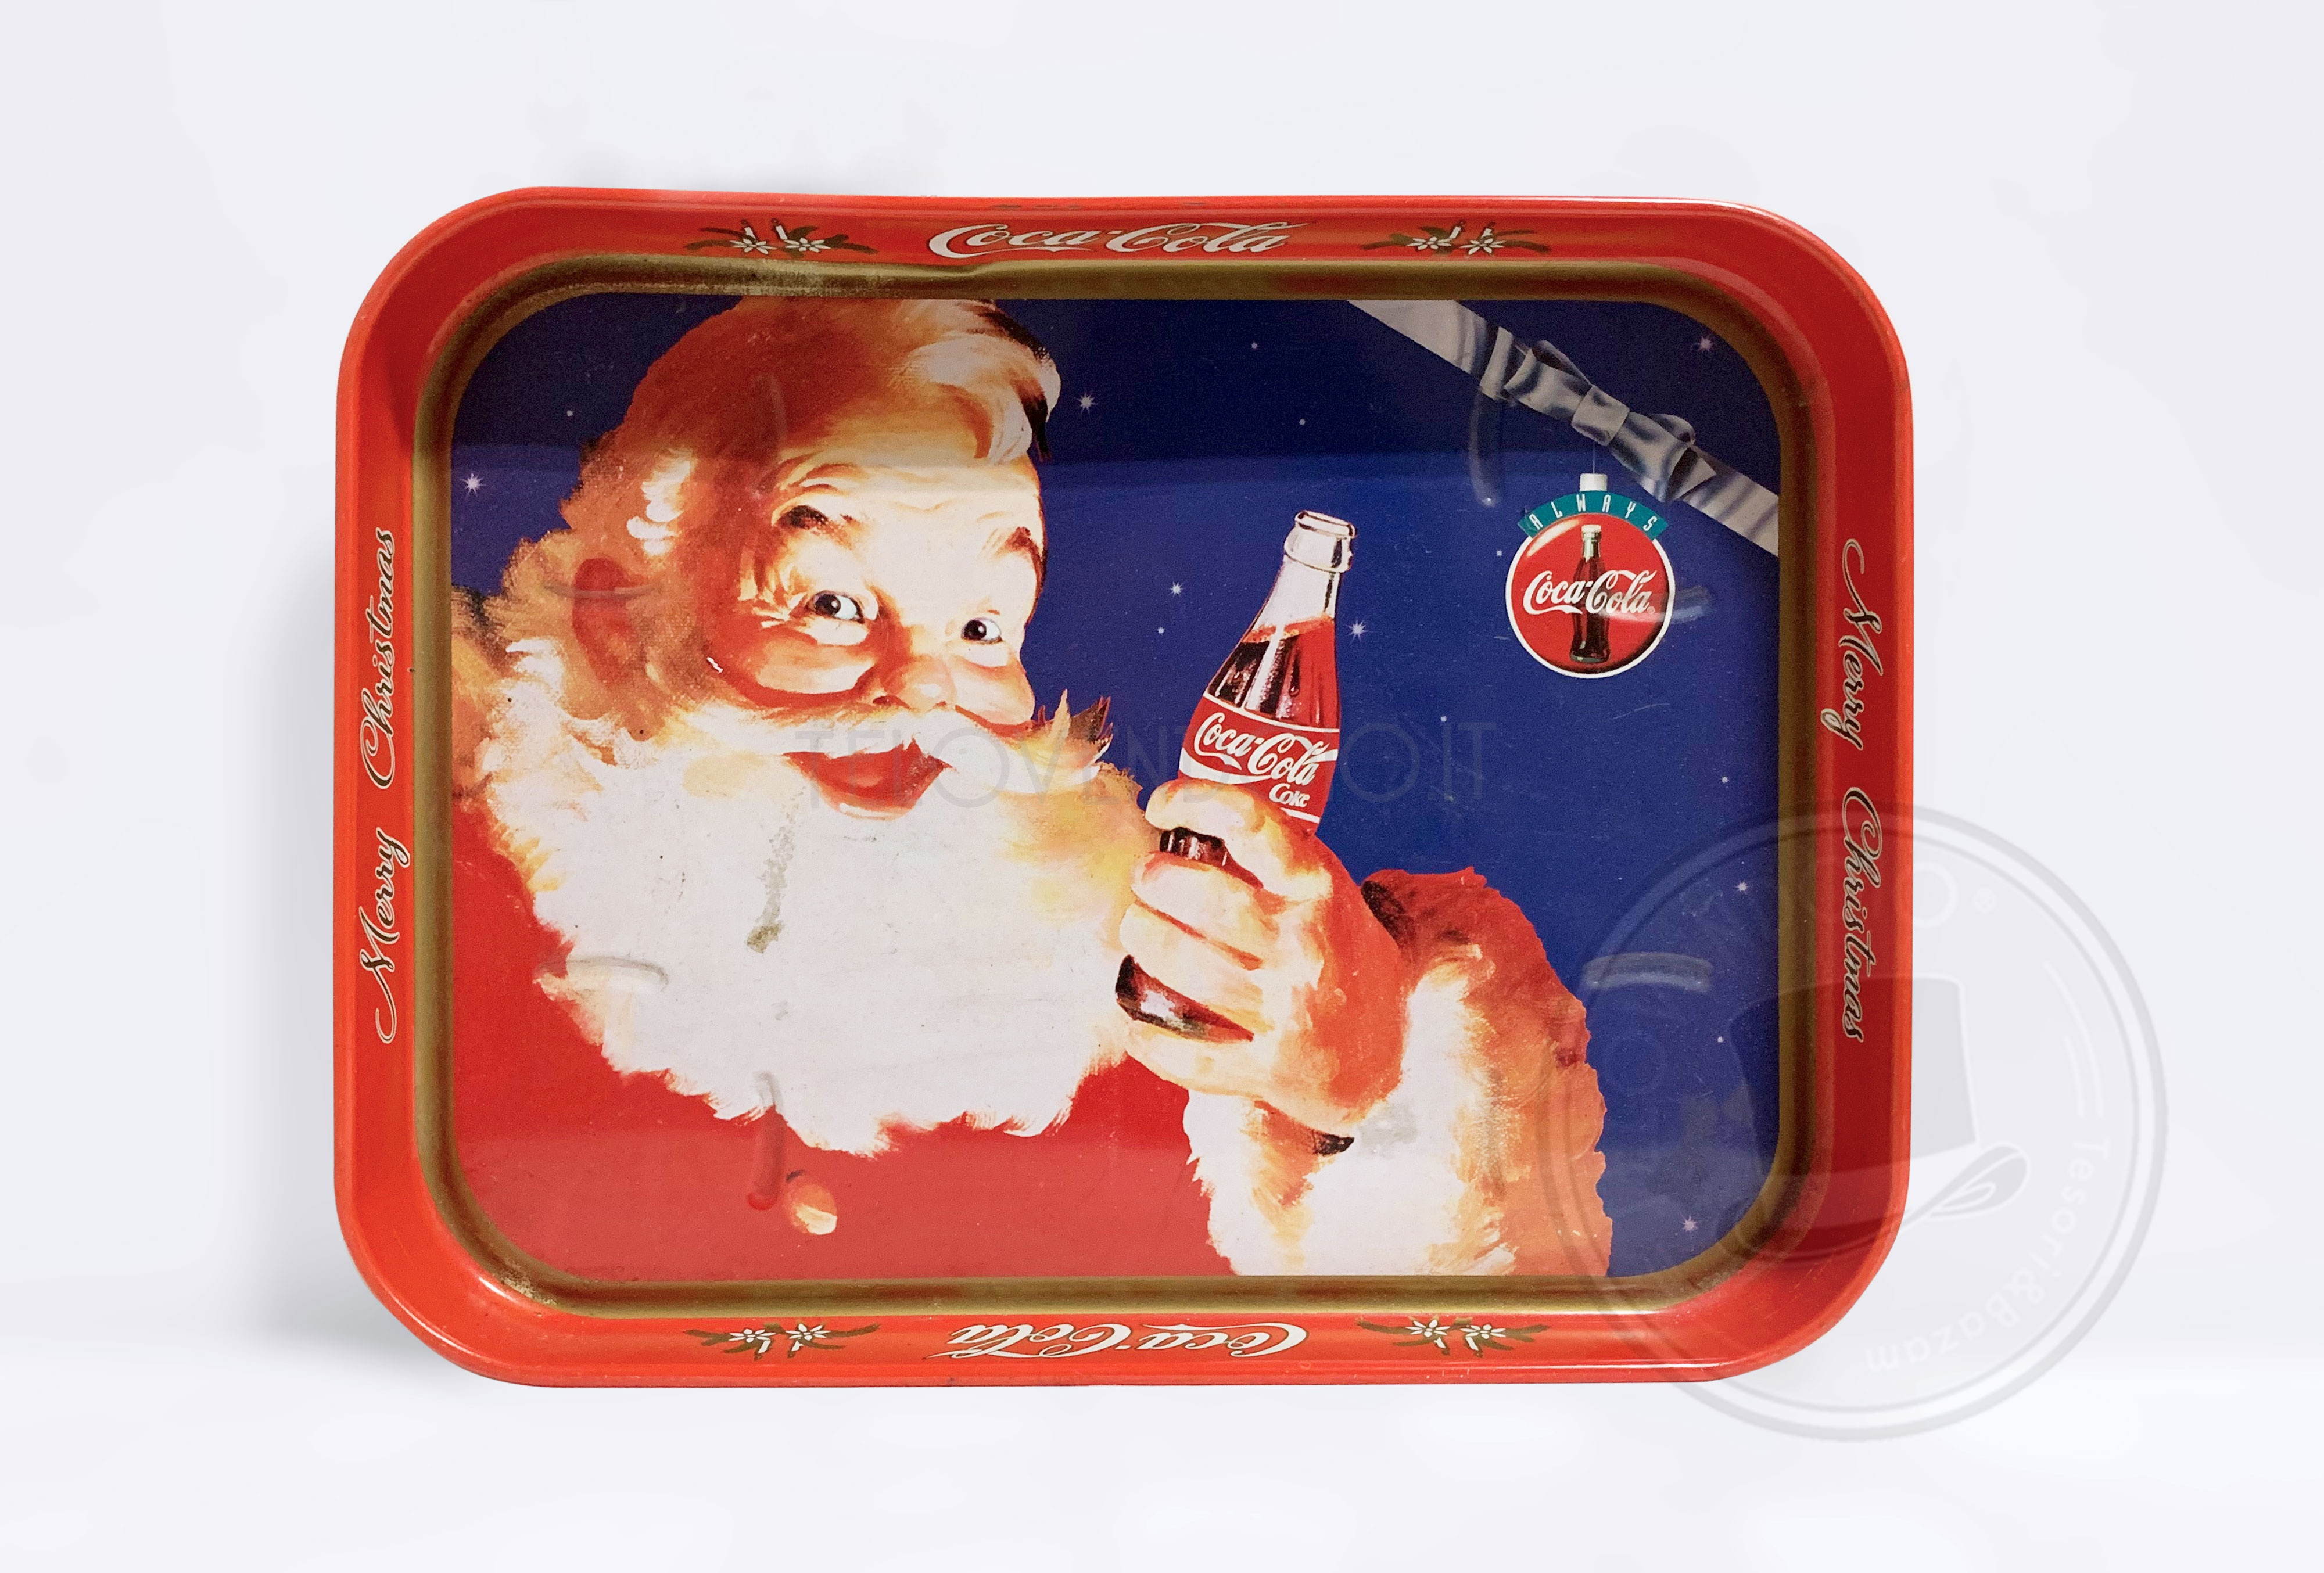 Coca Cola Babbo Natale.Vassoio Coca Cola Merry Christmas Con Babbo Natale Telovendoio